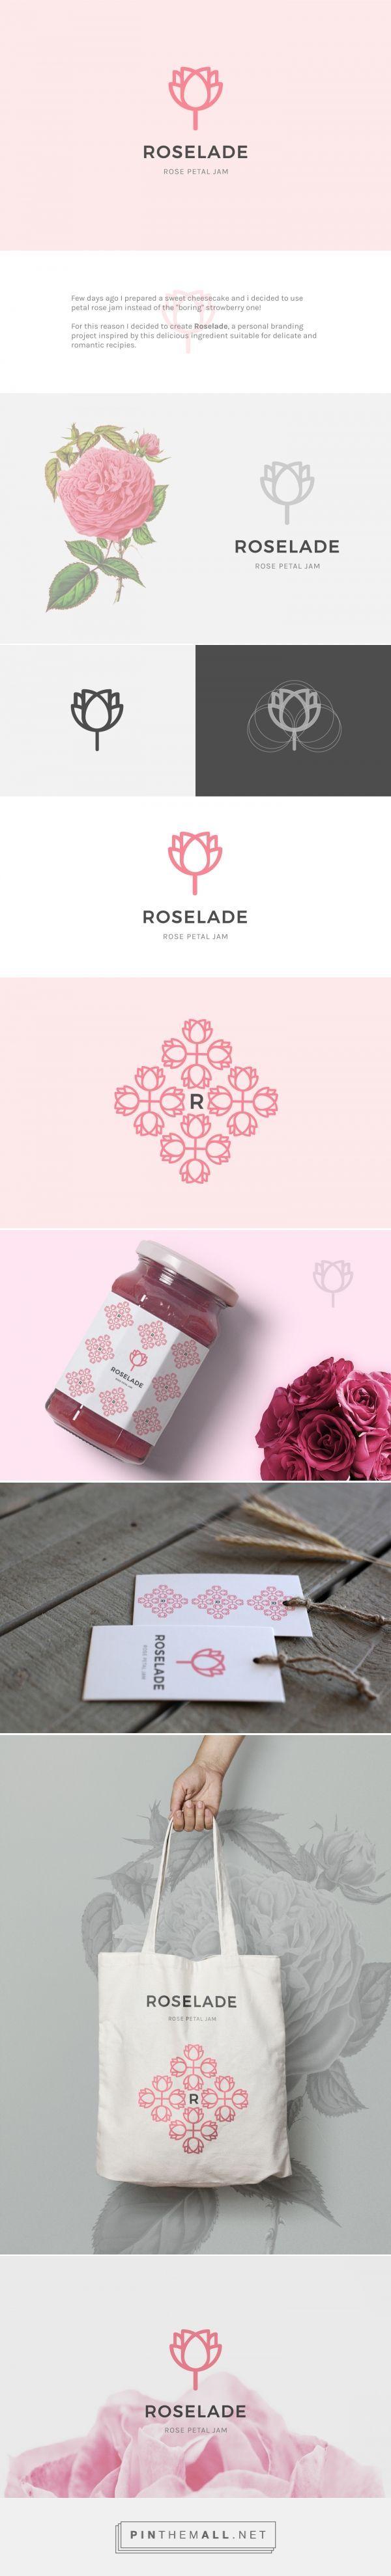 Roselade by Martina Cavalieri Few days ago I prepared a sweet cheesecake and i decided to use petal rose jam instead of the - created via https://pinthemall.net/?utm_content=buffercdec2&utm_medium=social&utm_source=pinterest.com&utm_campaign=buffer